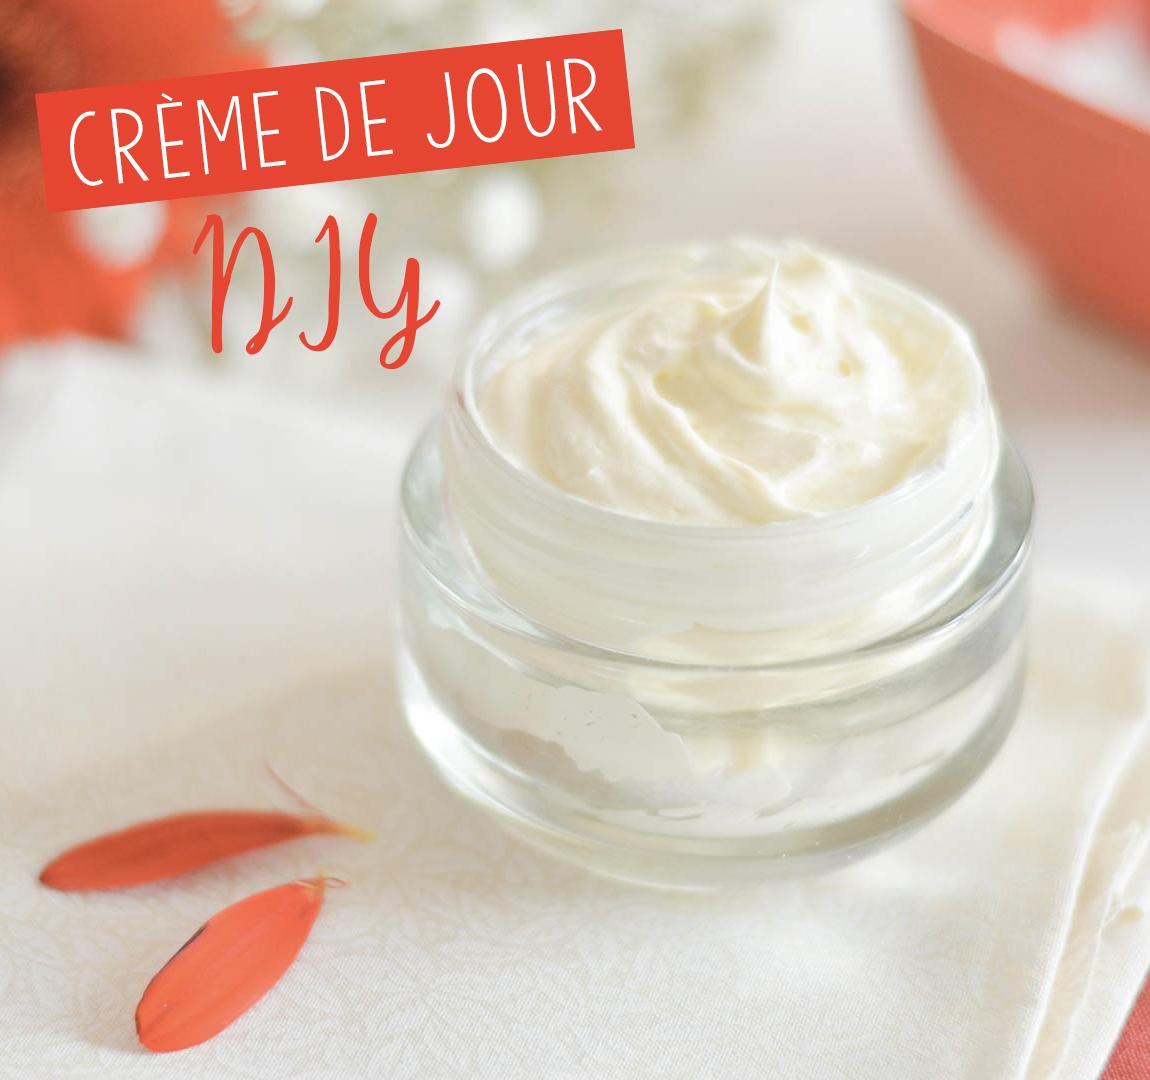 DIY crème visage - 3 ingrédients (vidéo)